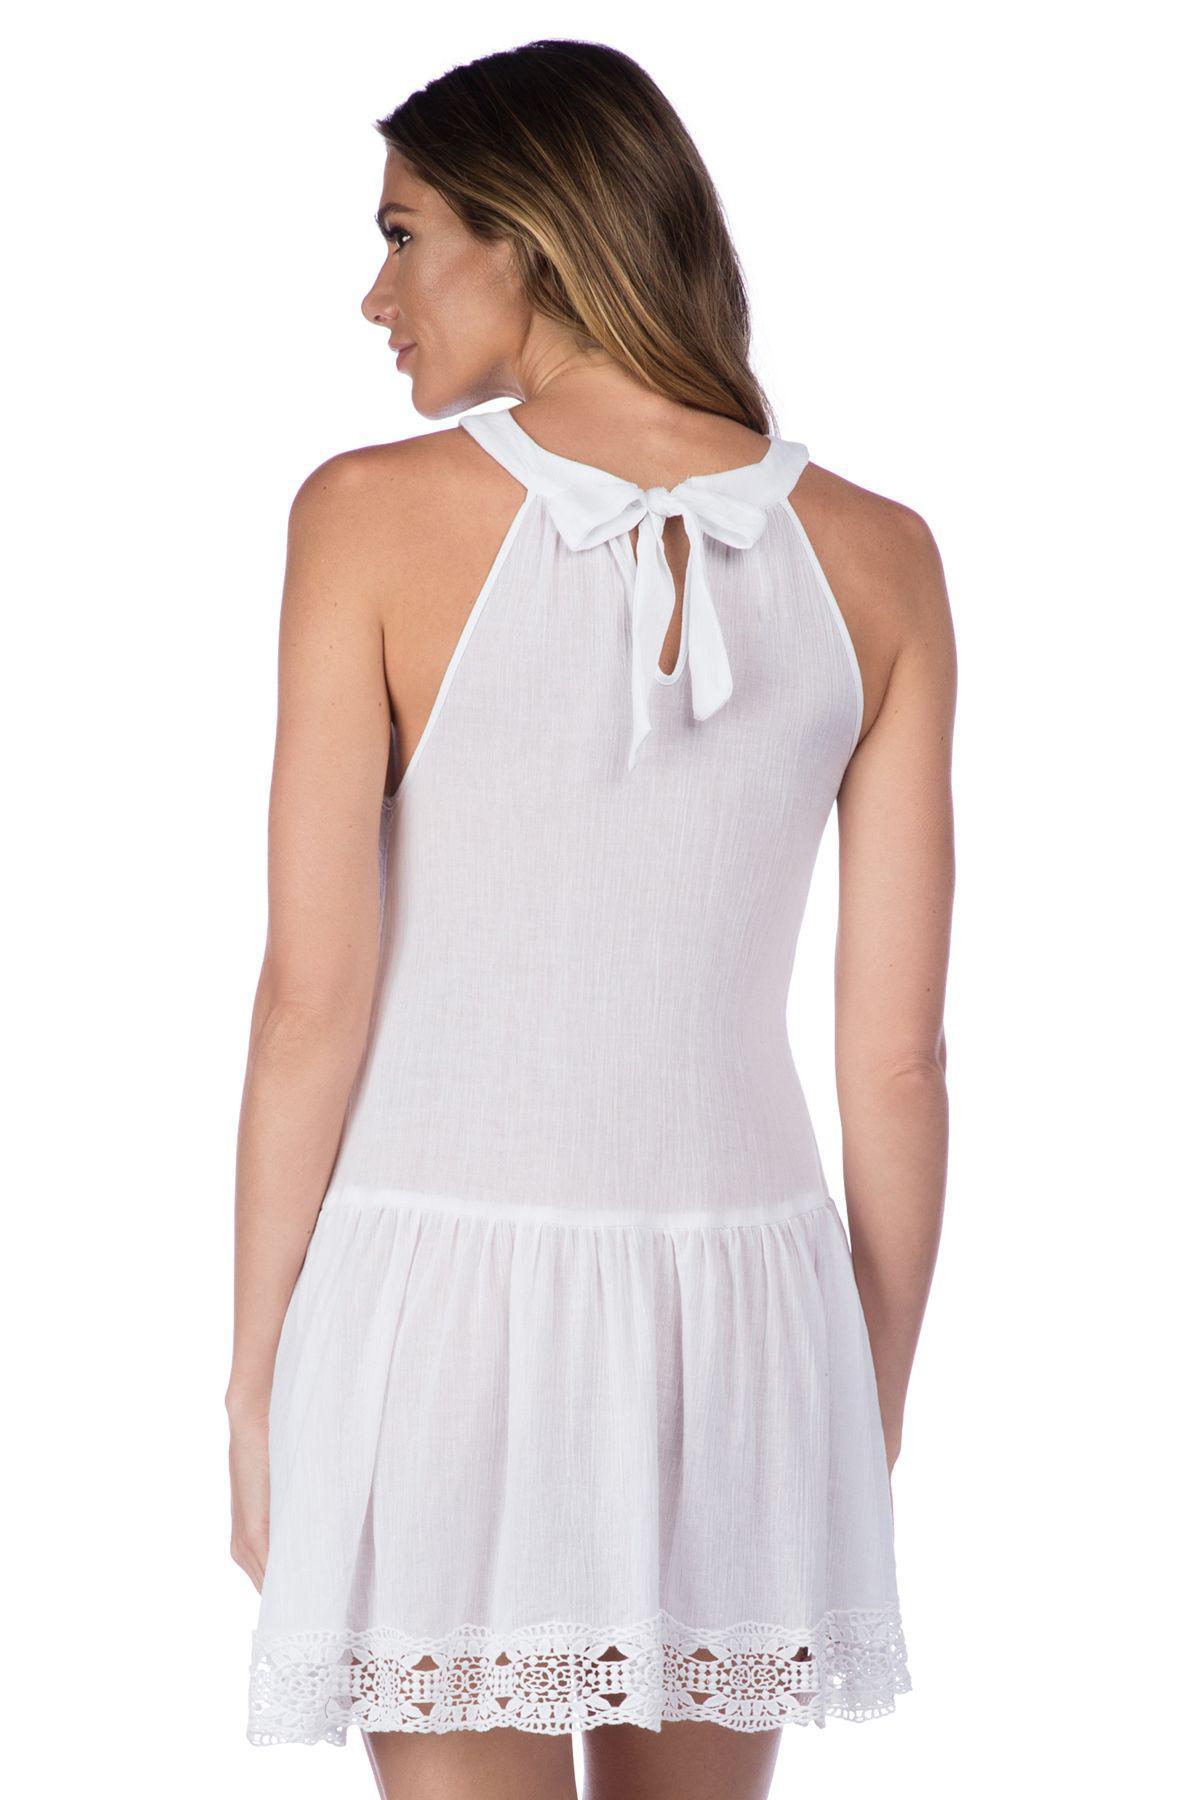 02955062cf La Blanca - White Island Fare High Neck Short Dress Swim Cover Up - Lyst.  View fullscreen